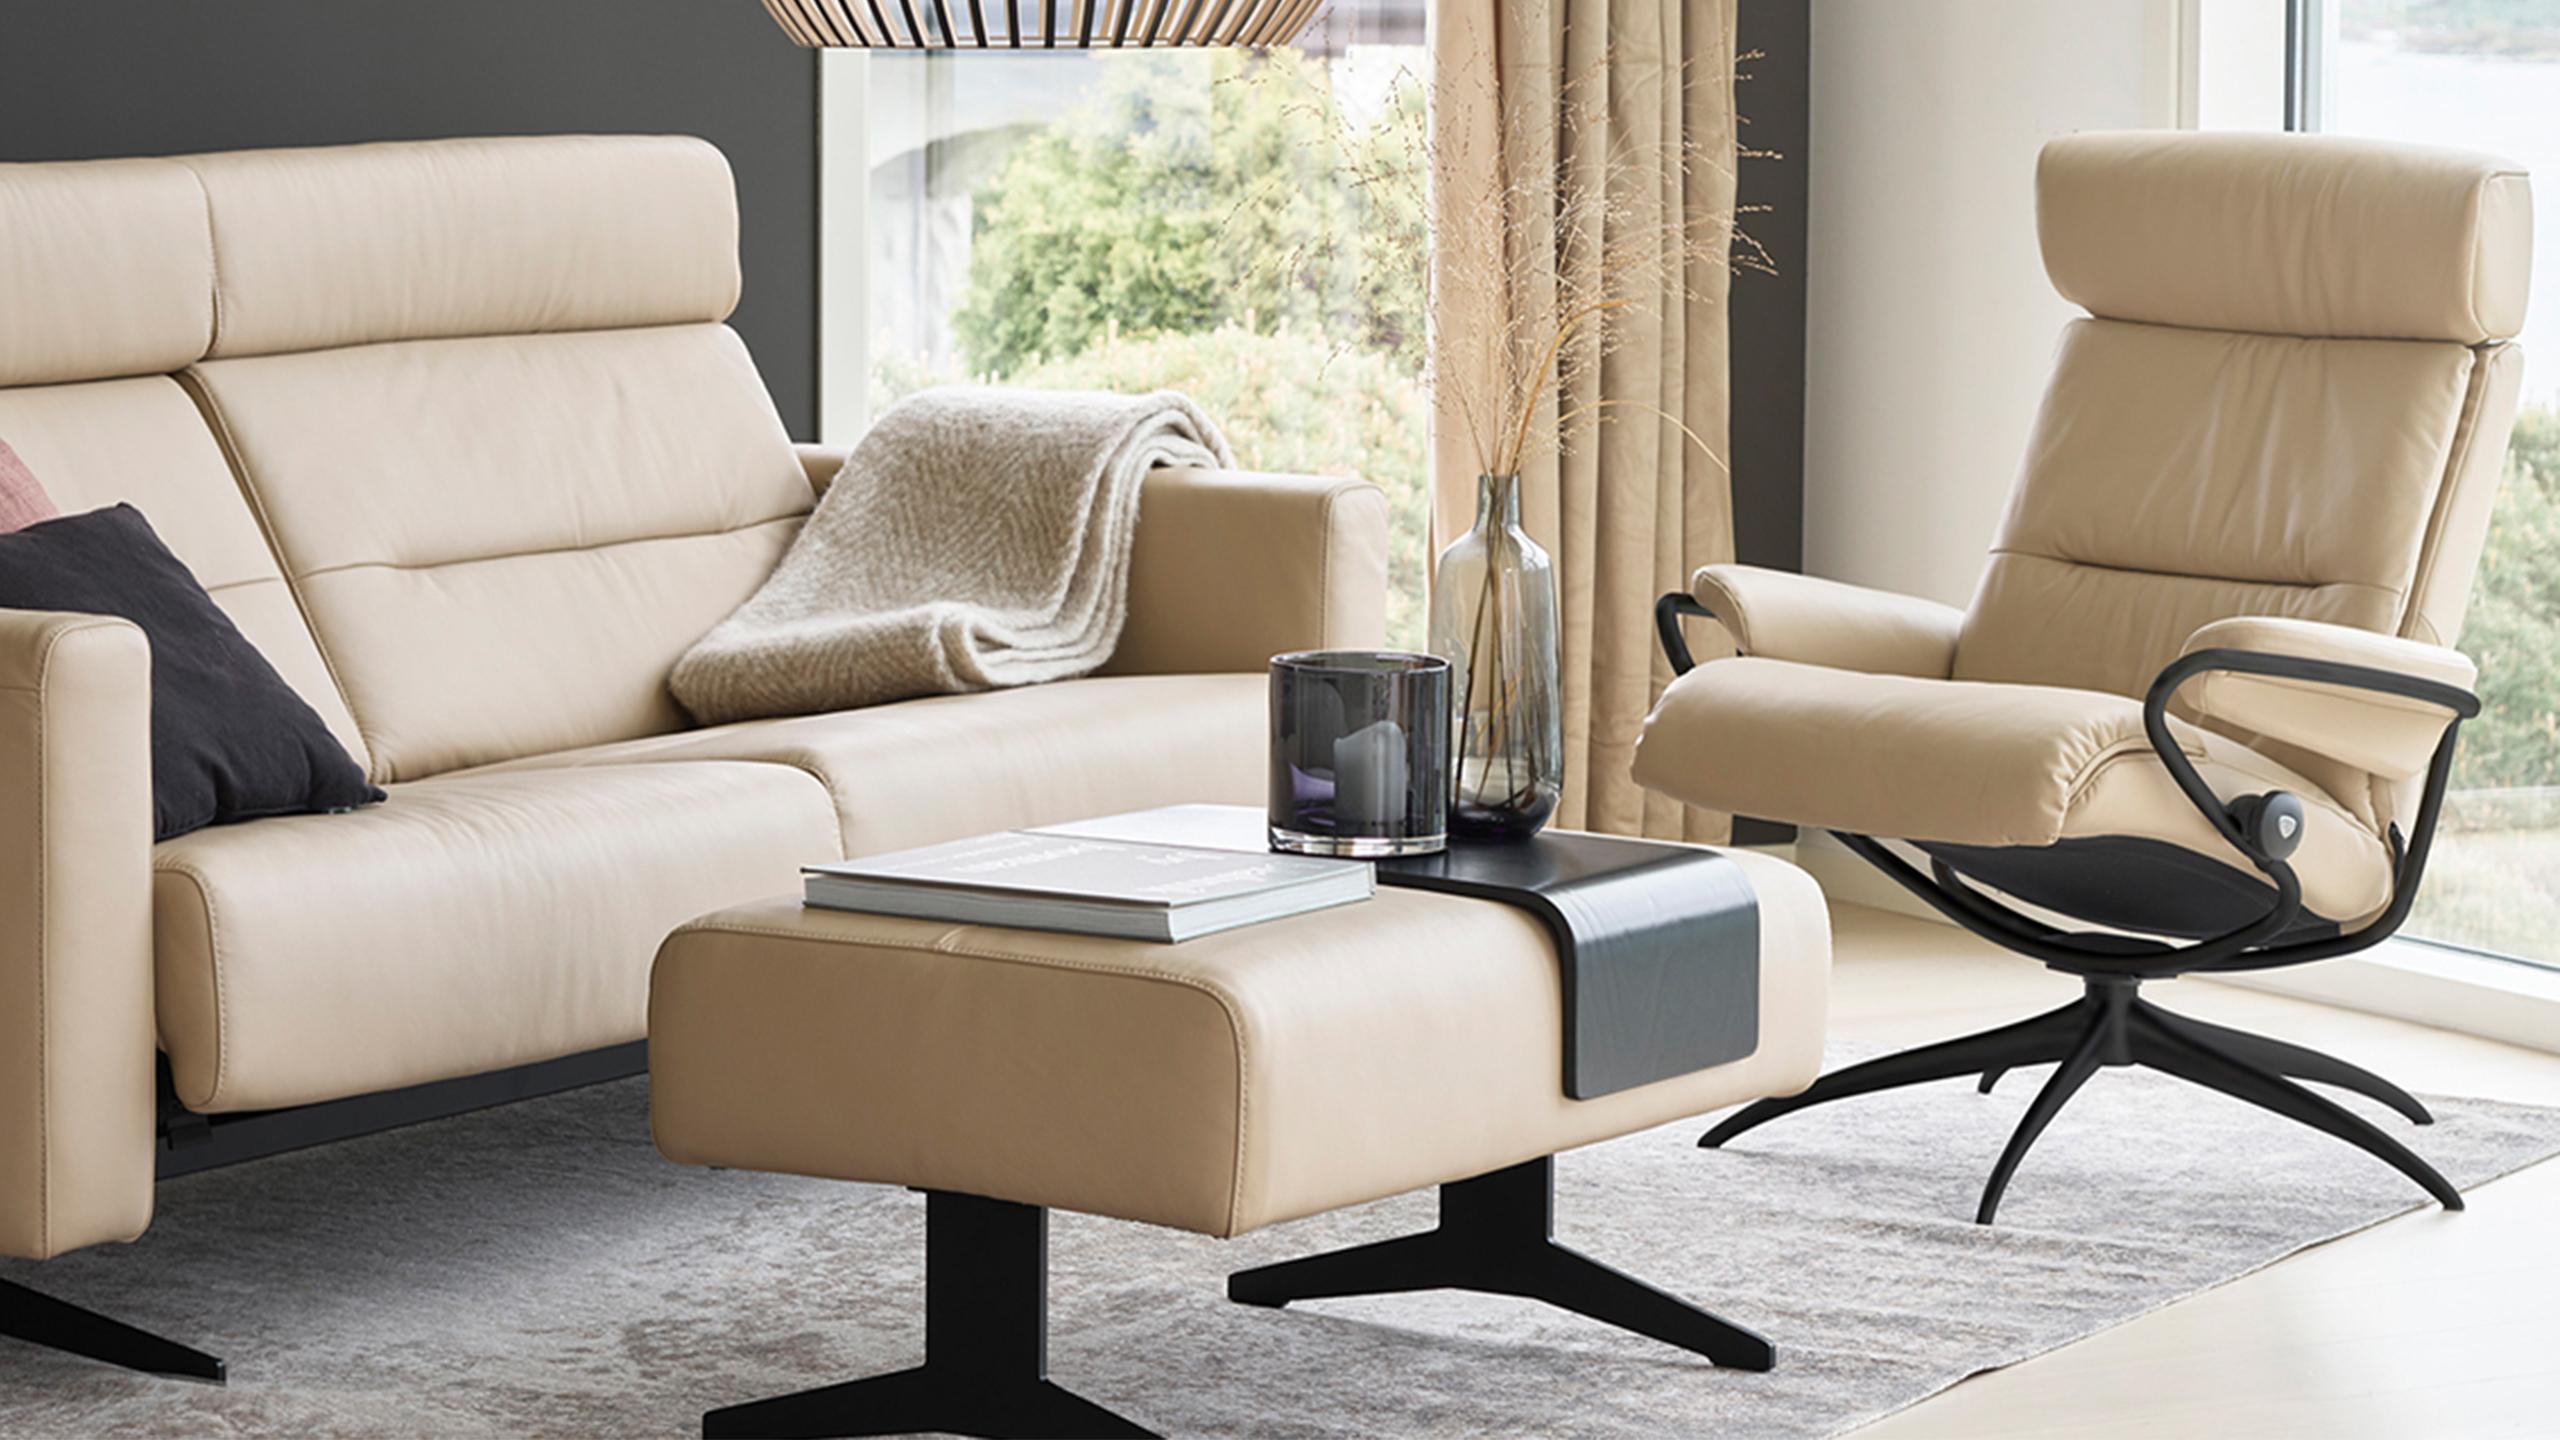 Full Size of Stressless Sofa Leather Couch Canada Ebay Kleinanzeigen Furniture Usa Nz Used Cost Luxus Entspannung Komfort Pur Bei Mbel Staude Chesterfield Grau Grünes L Sofa Stressless Sofa